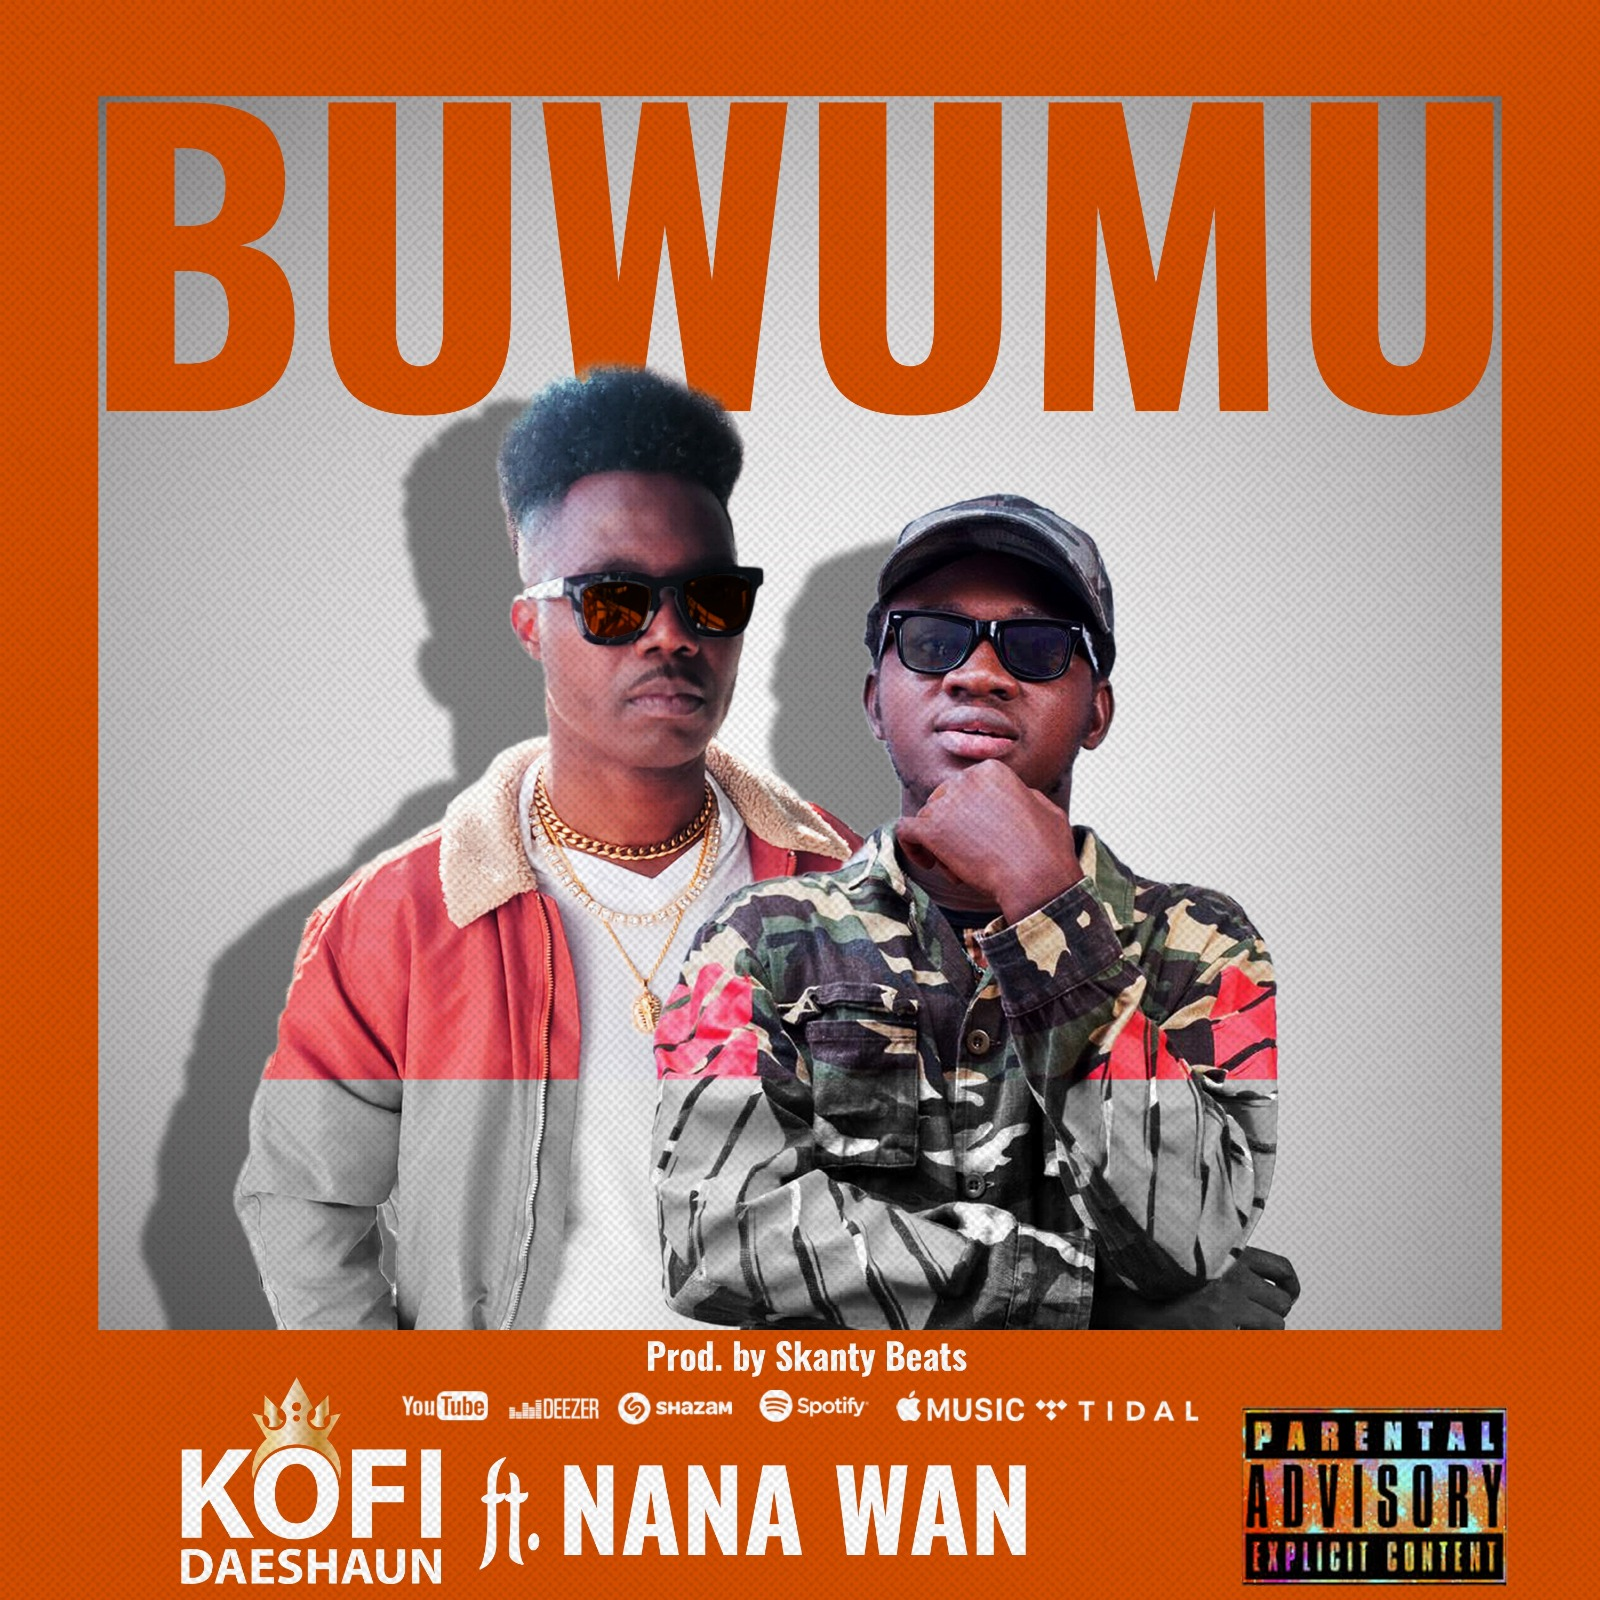 Kofi Daeshaun - BUWUMU ft Nana Wan